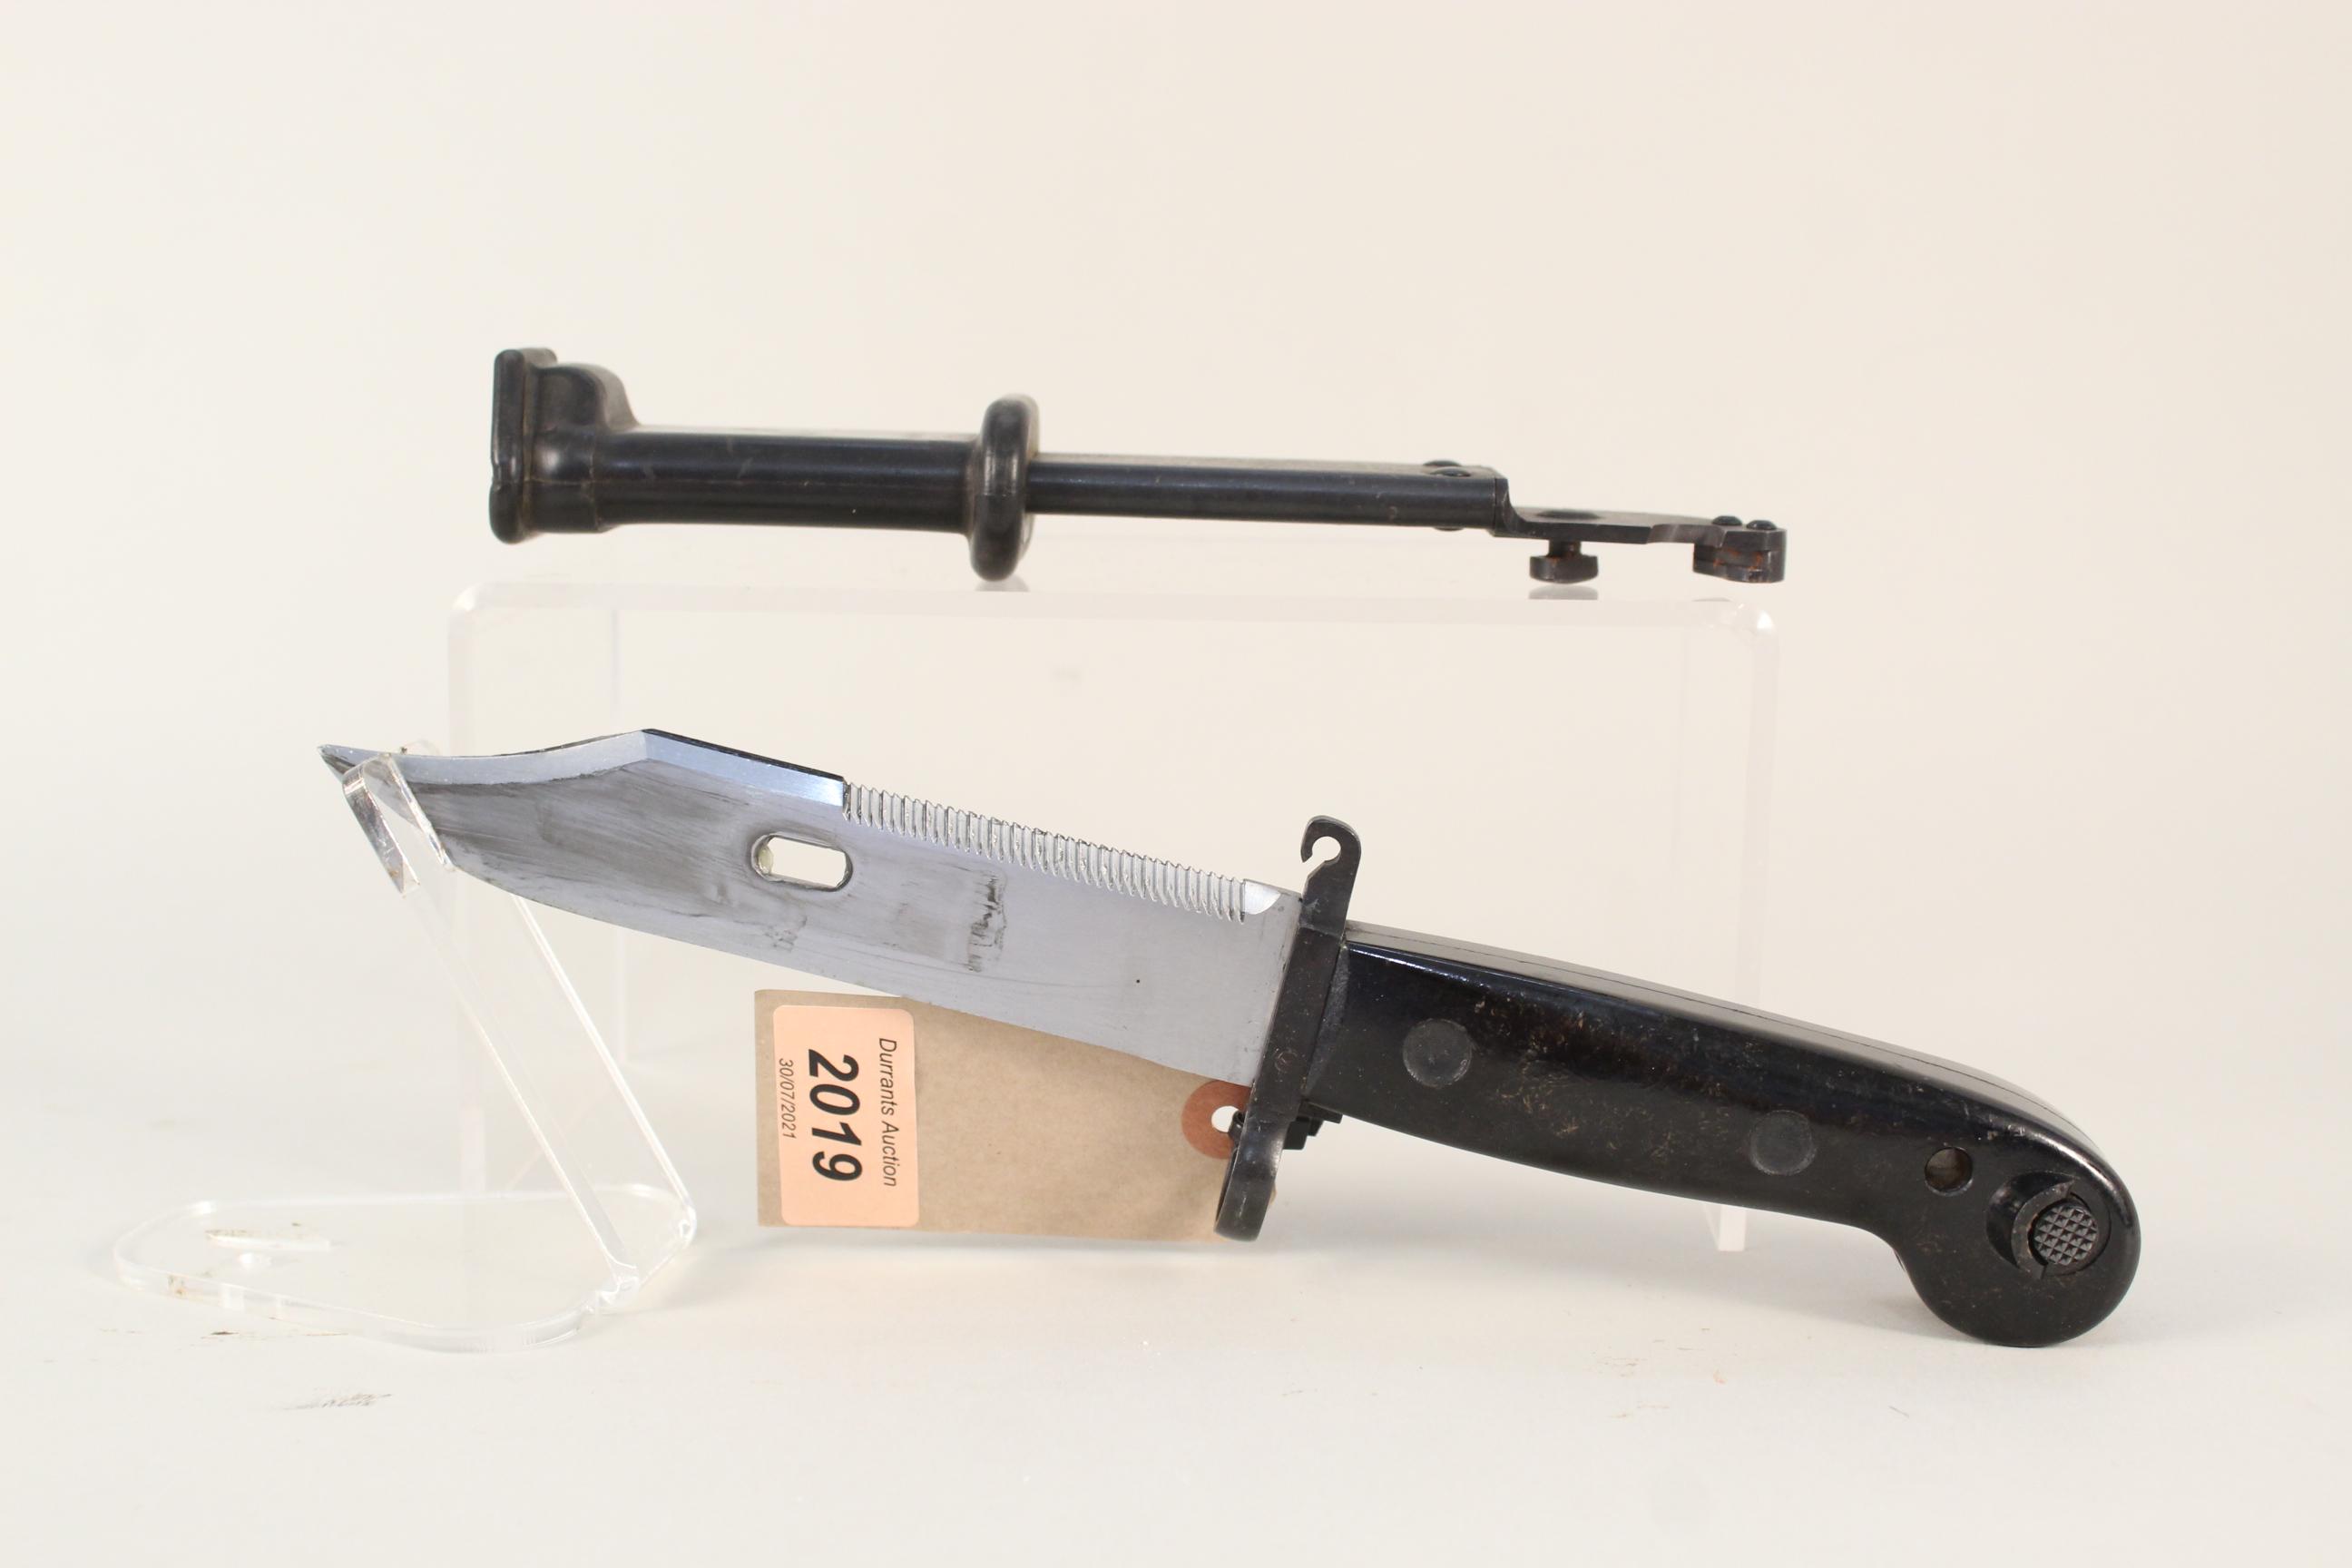 An East German knife bayonet for the model '59' AK,